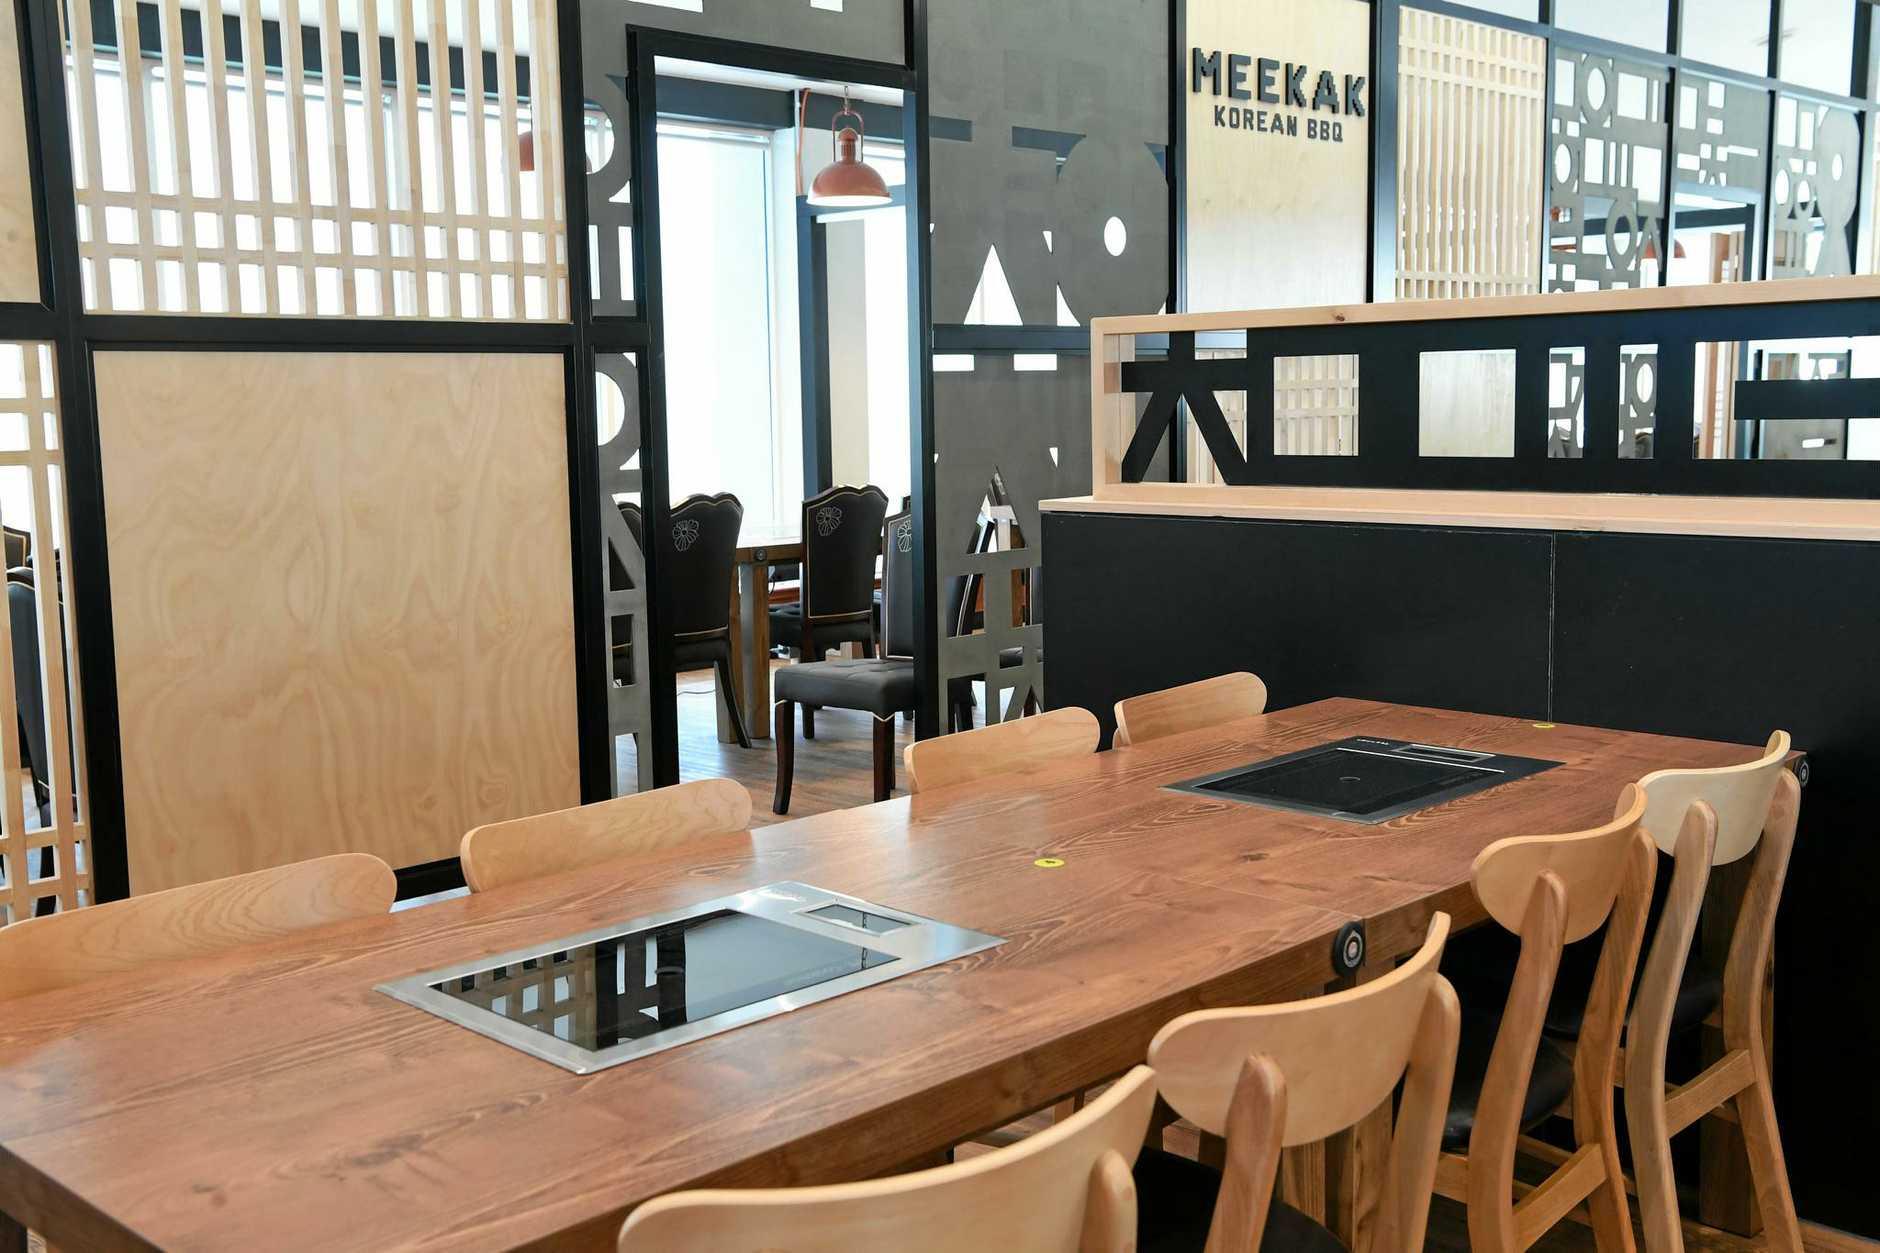 MEEKAK: Iinside the new Korean restaurant in Bourbong Street.